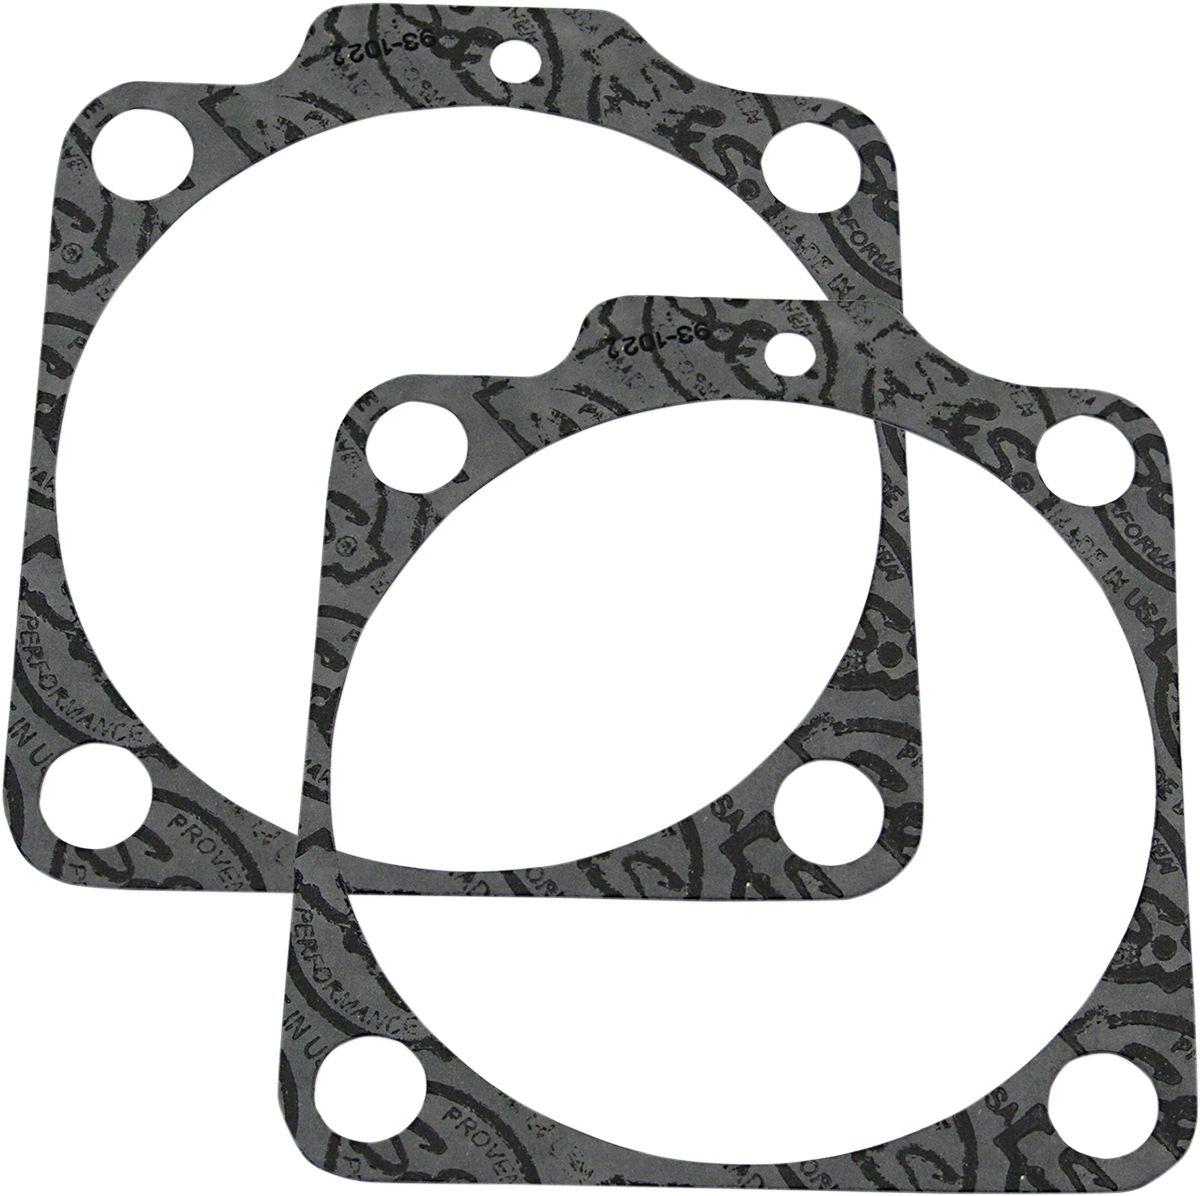 "【S&S CYCLE】汽缸下墊片/ 3-5/8"" SHVL 【GASKETS BASE 3-5/8""SHVL [0934-5024]】 - 「Webike-摩托百貨」"